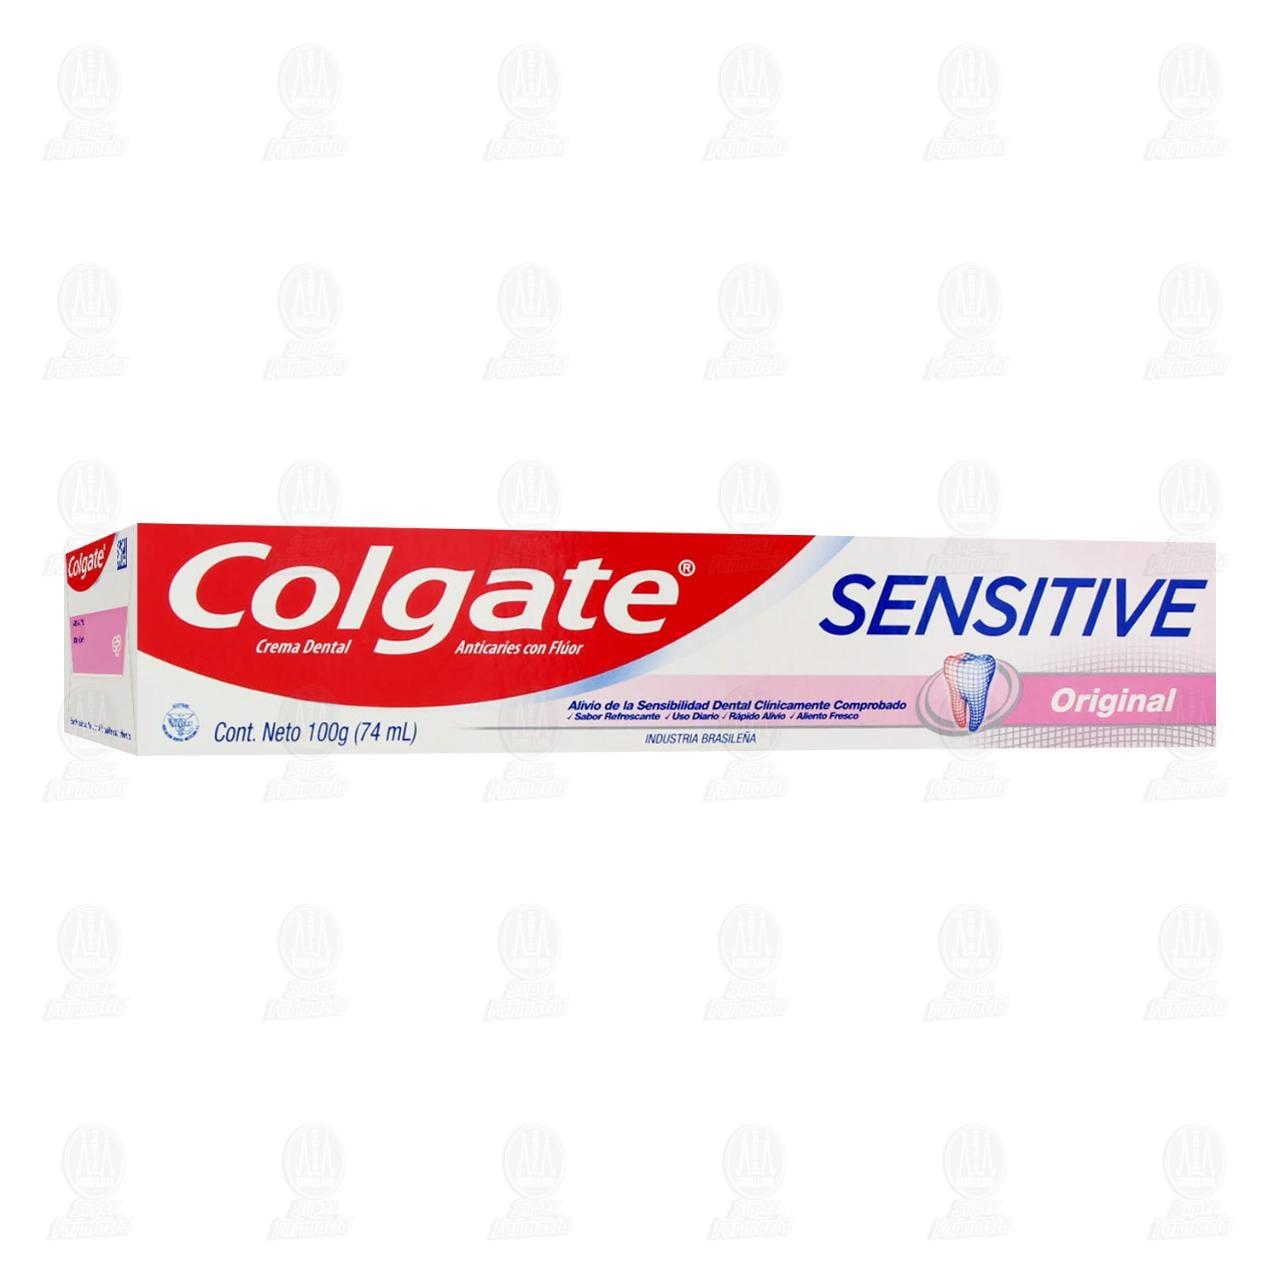 Comprar Pasta Dental Colgate Sensitive Original, 74 ml. en Farmacias Guadalajara